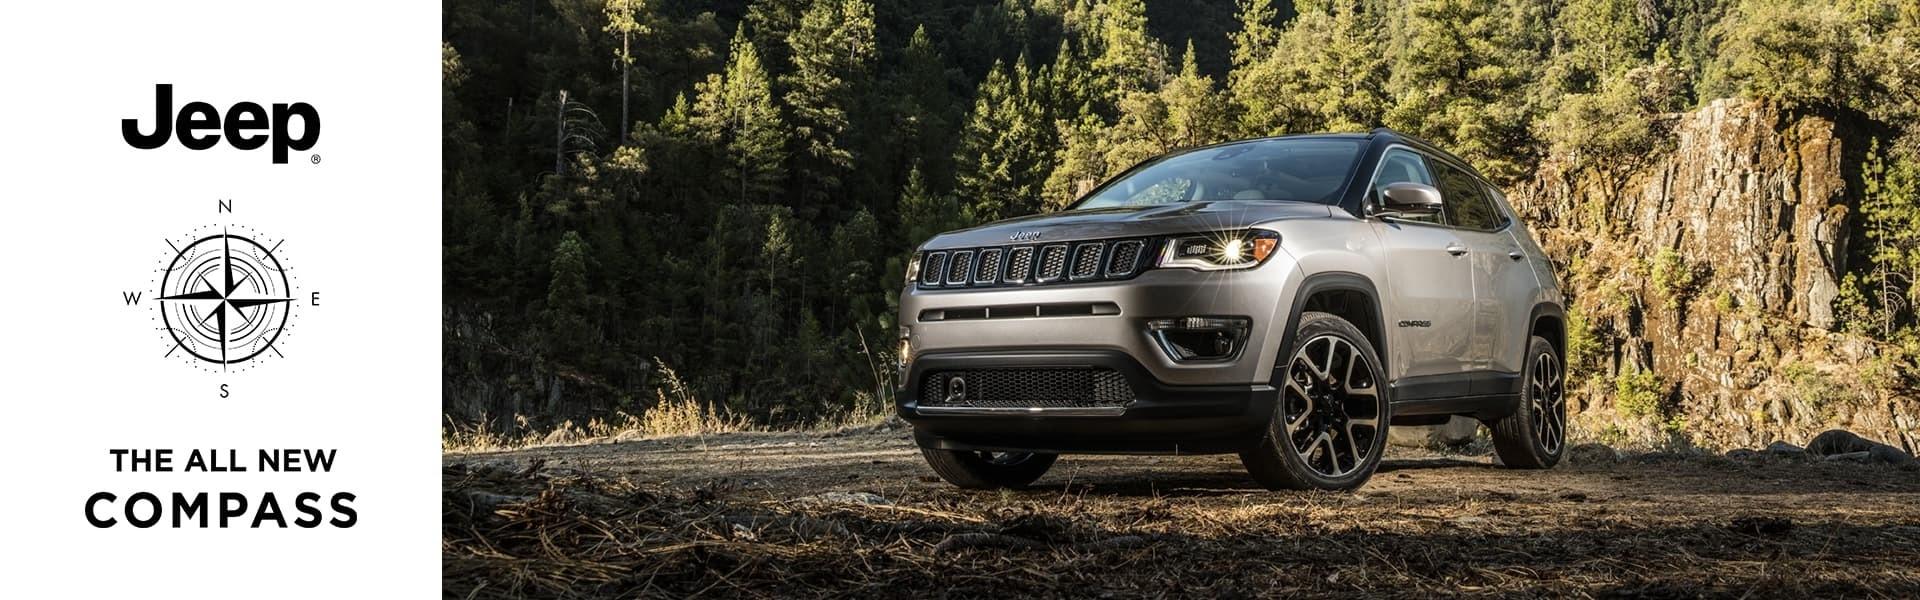 Brooks CDJR | Chrysler, Dodge, Jeep, Ram Dealer In Jackson, AL